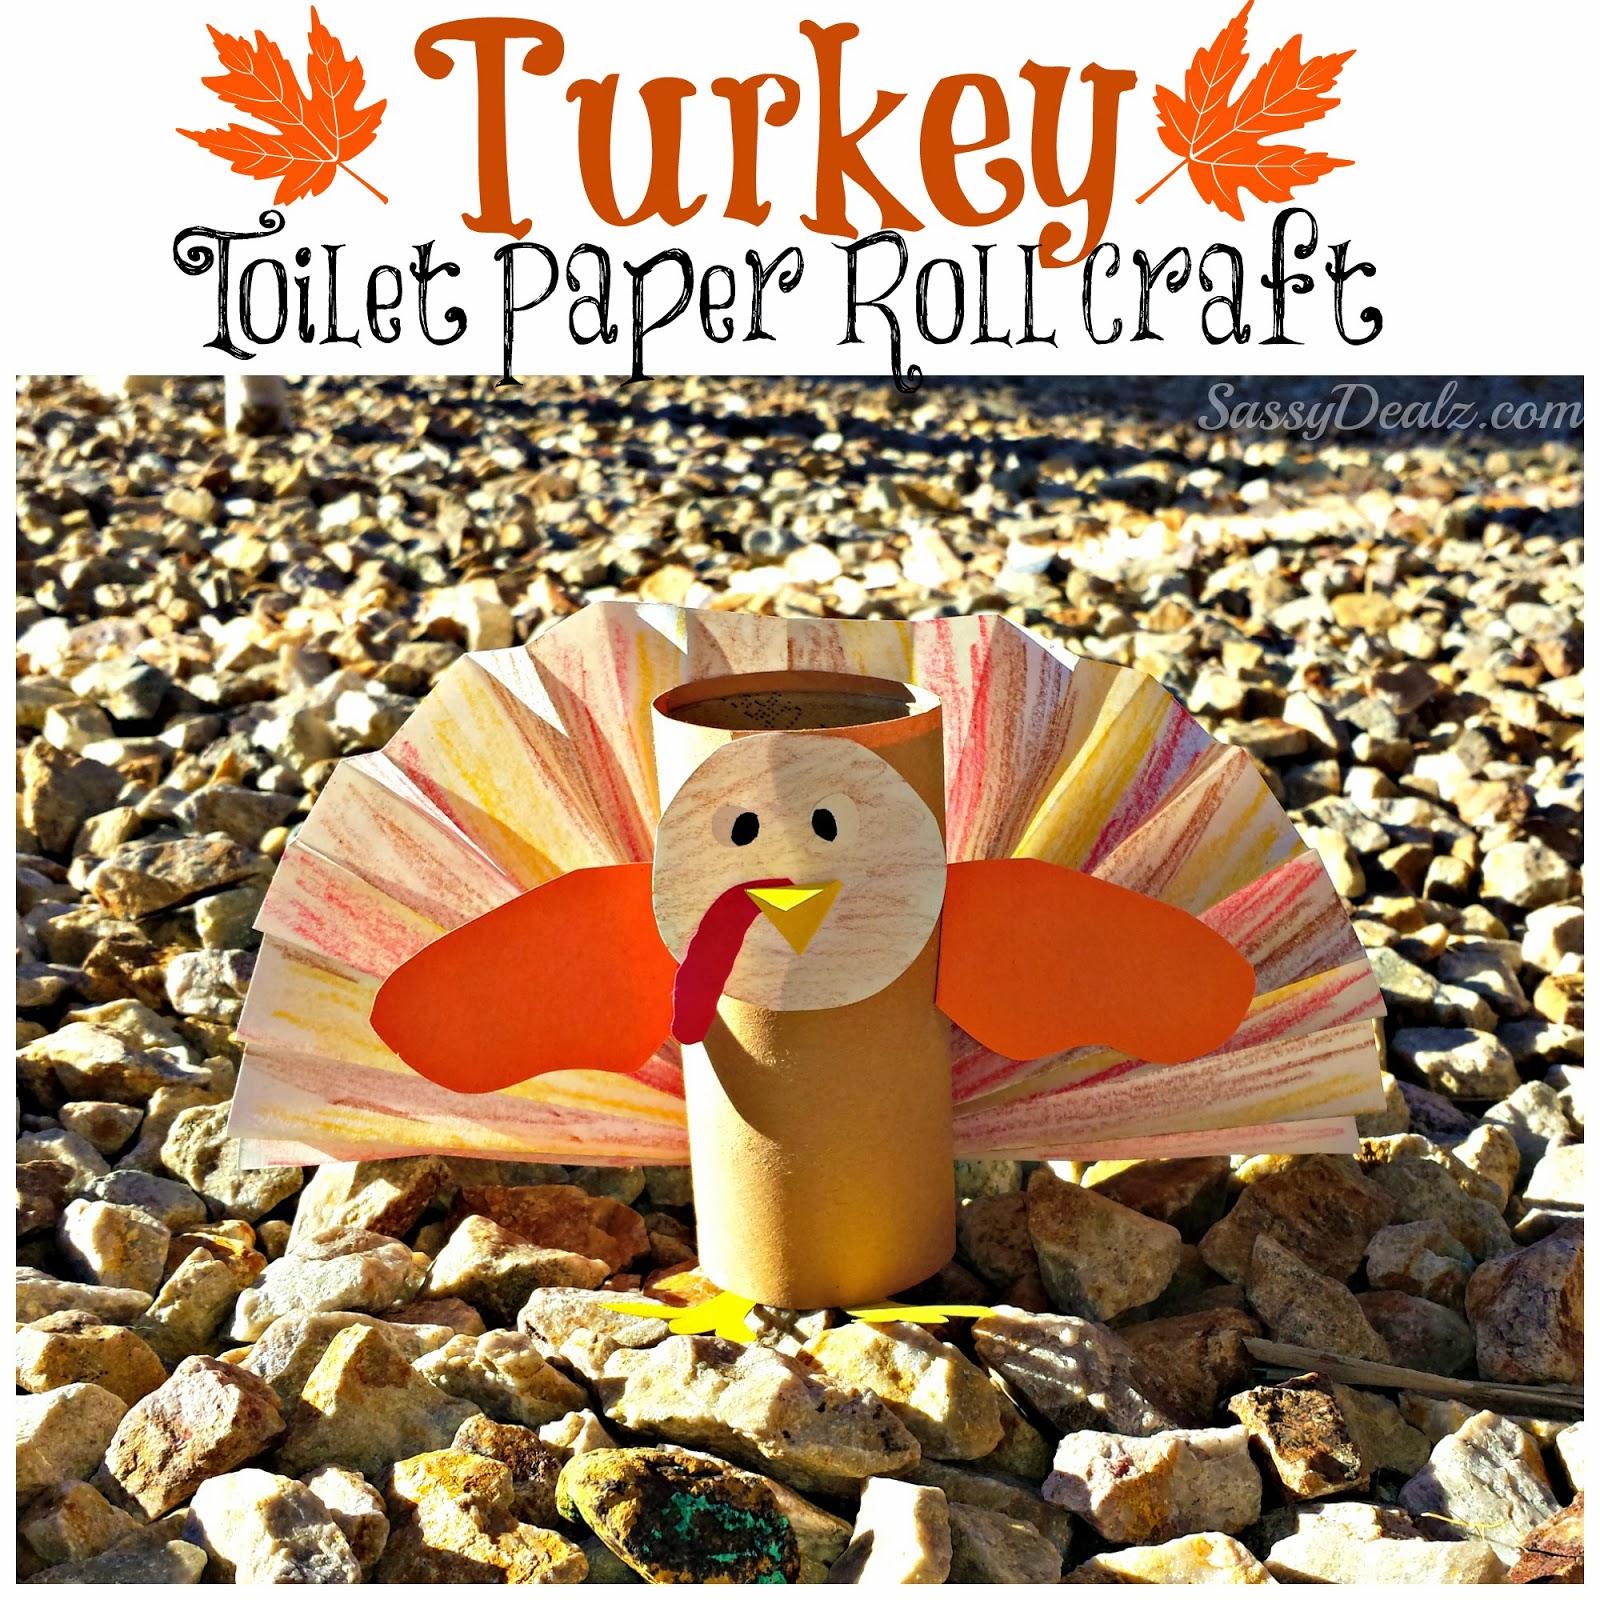 Kids and Art: 10 Fun Fall Crafts | Mommy University  |Toilet Paper Turkey